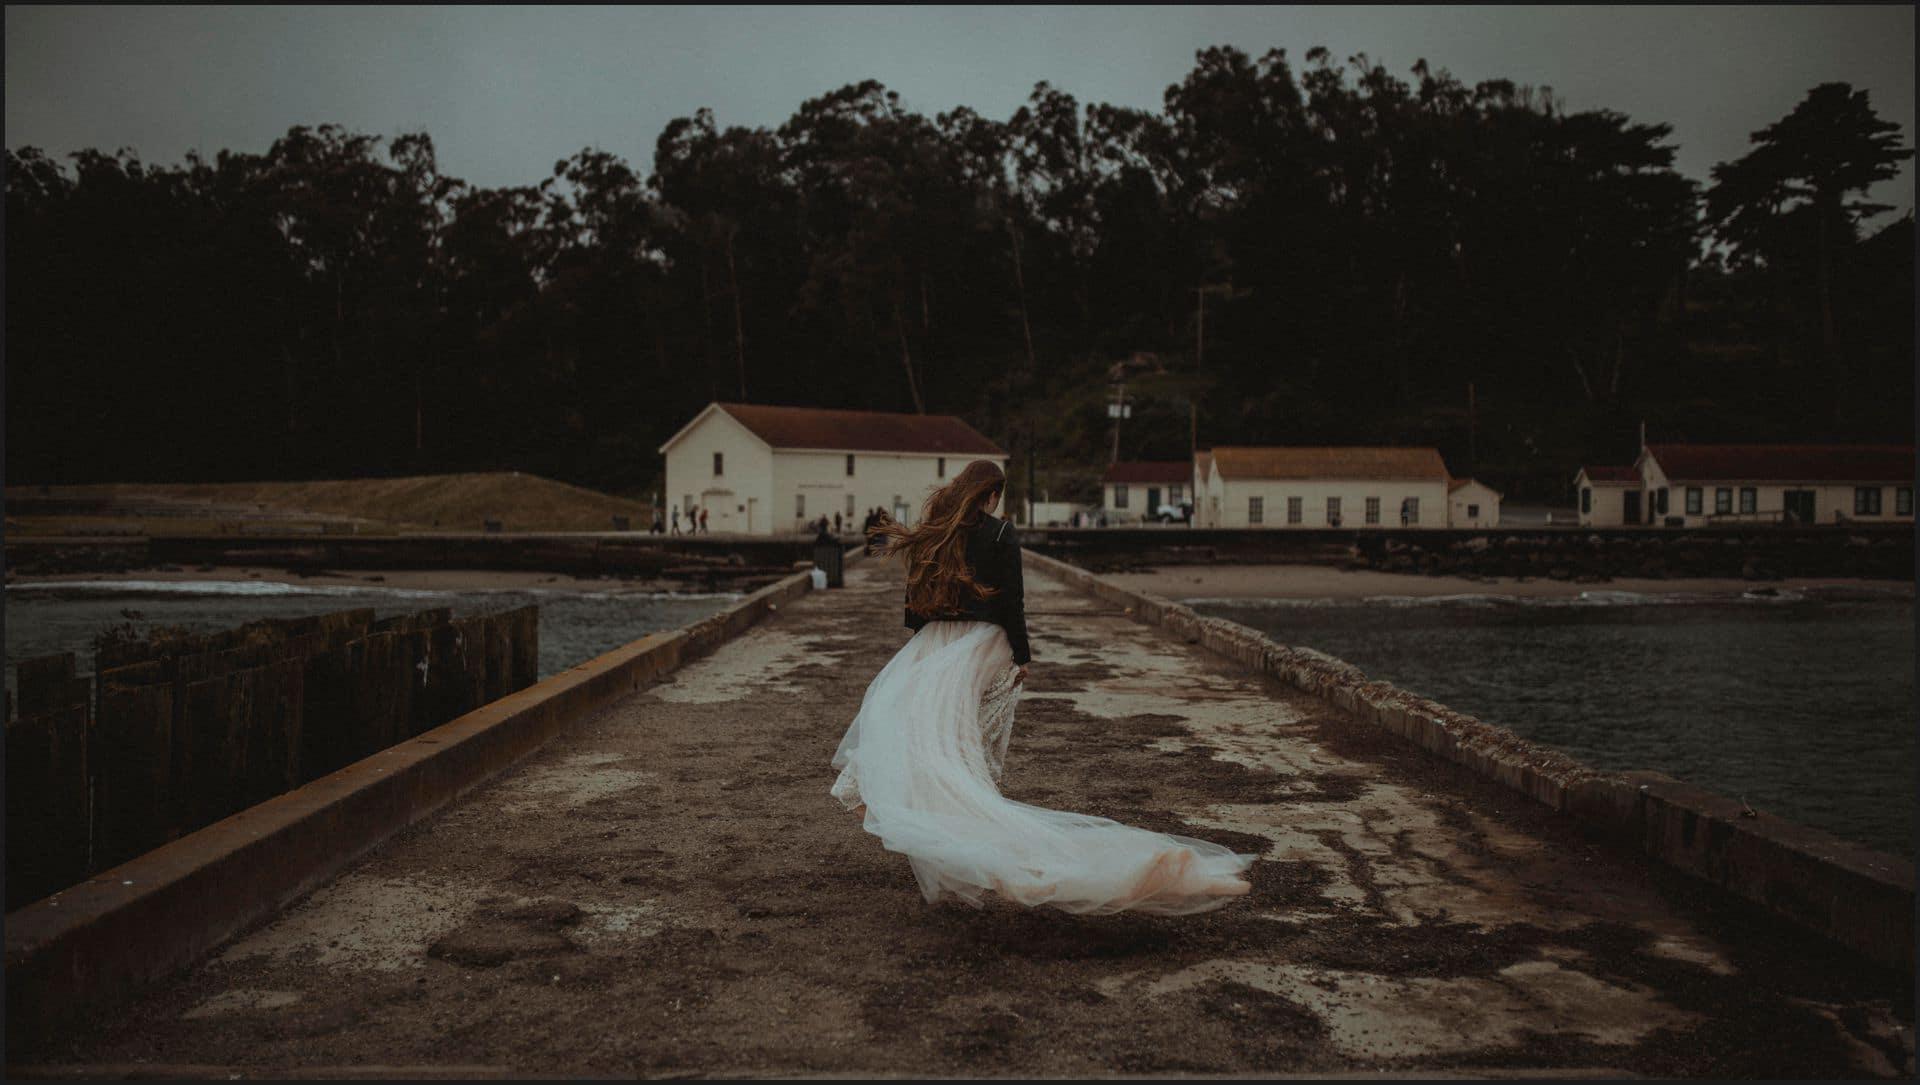 san francisco, california, elopement wedding, bride dress